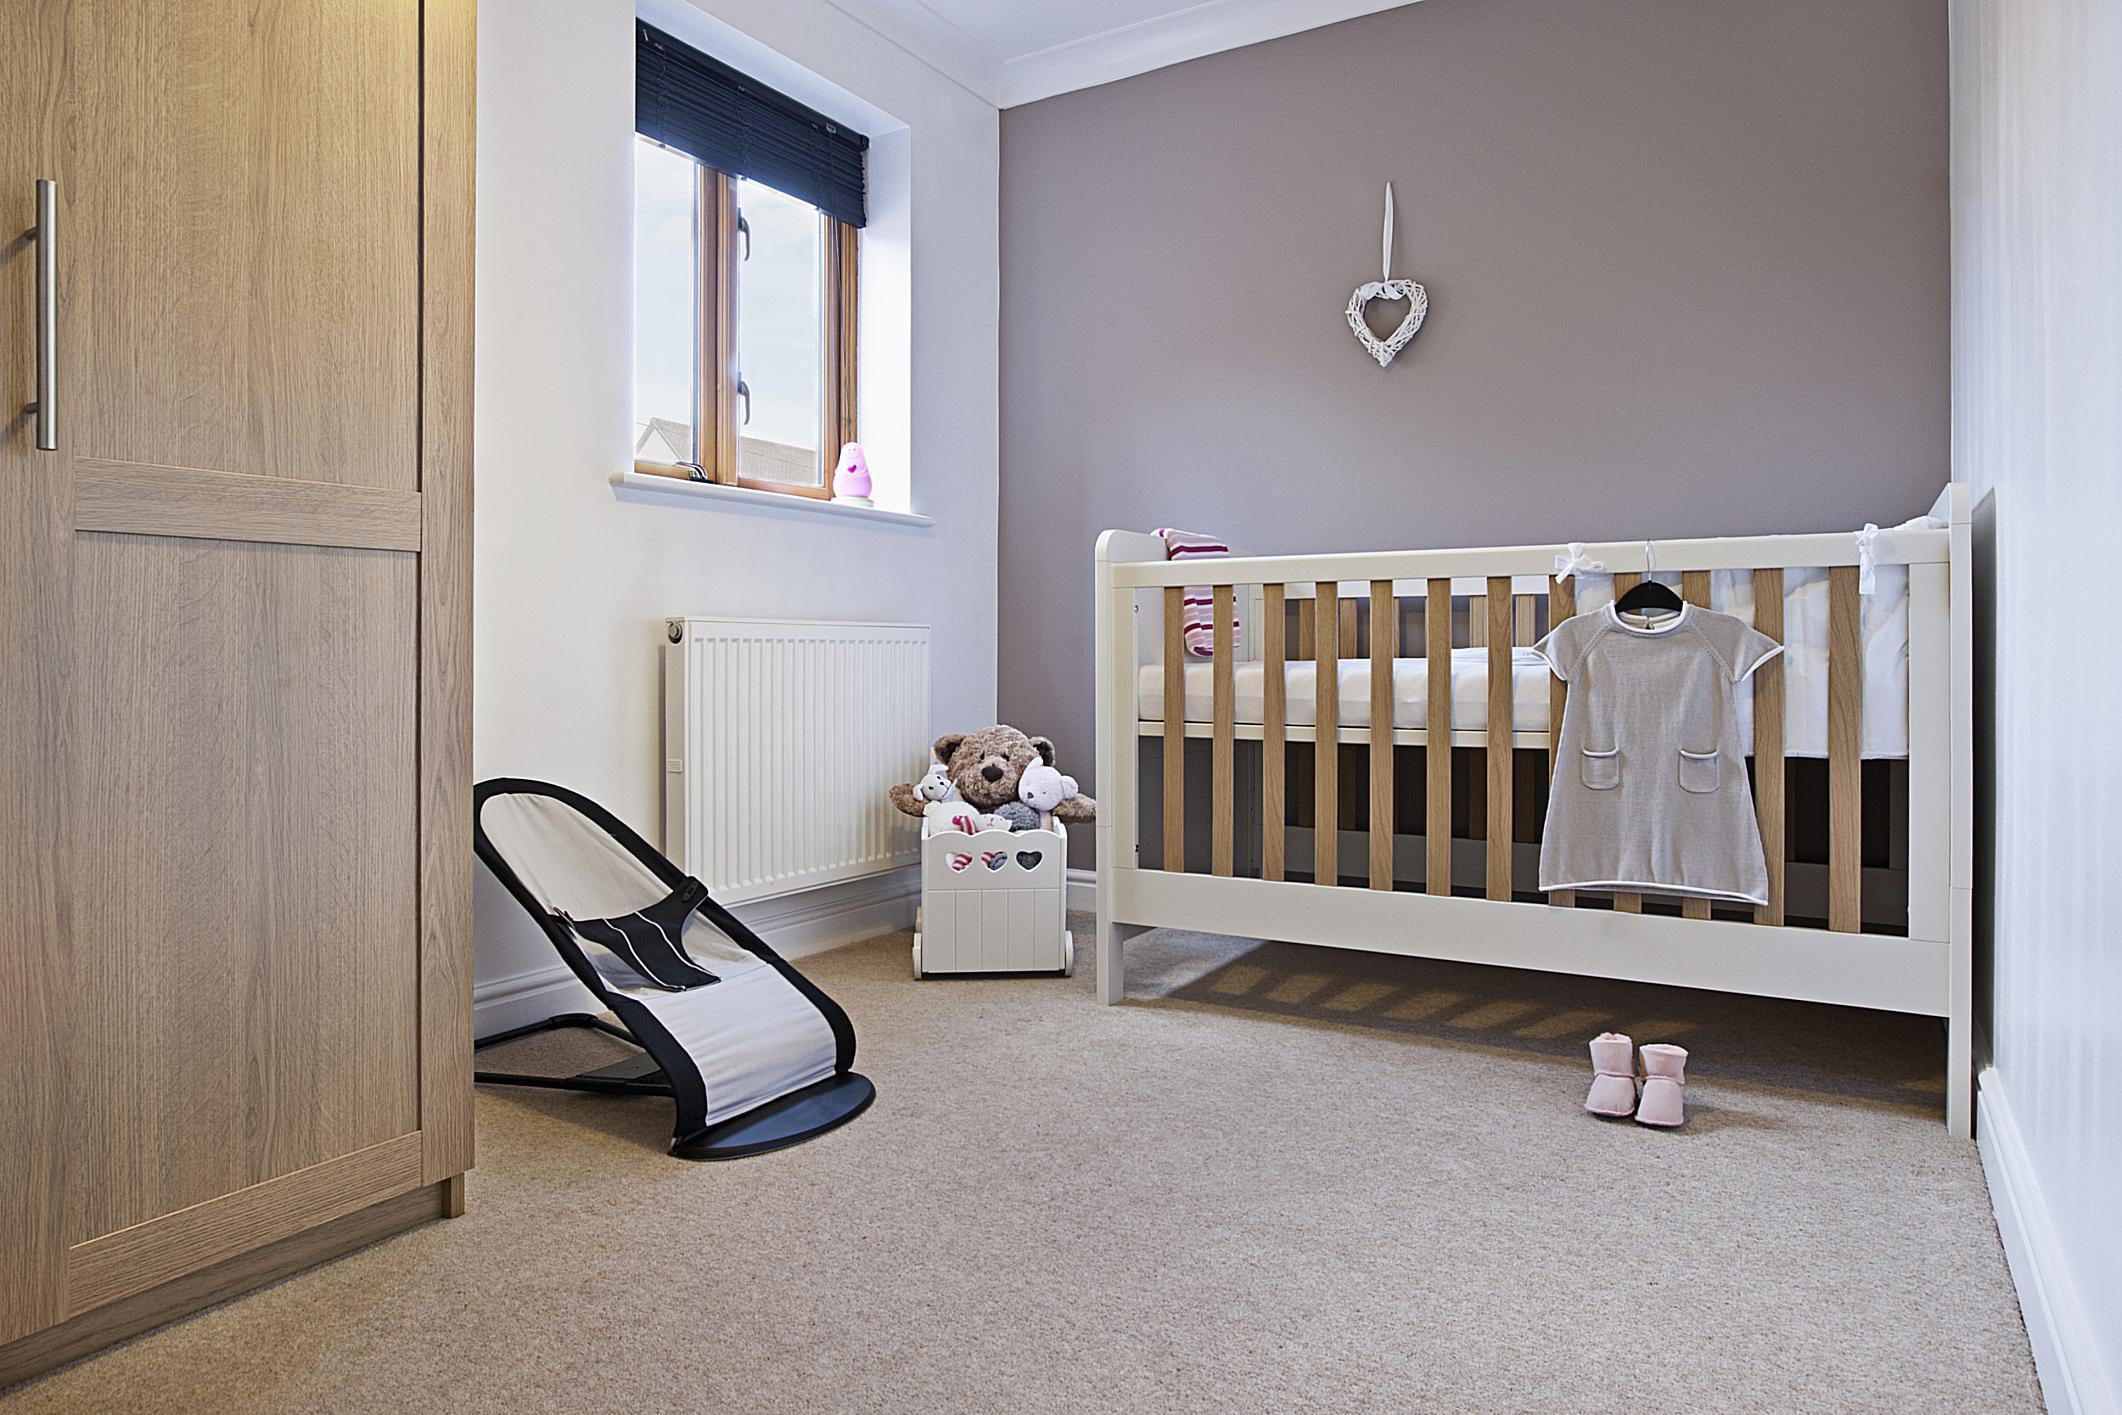 Baby shower gift registry ideas